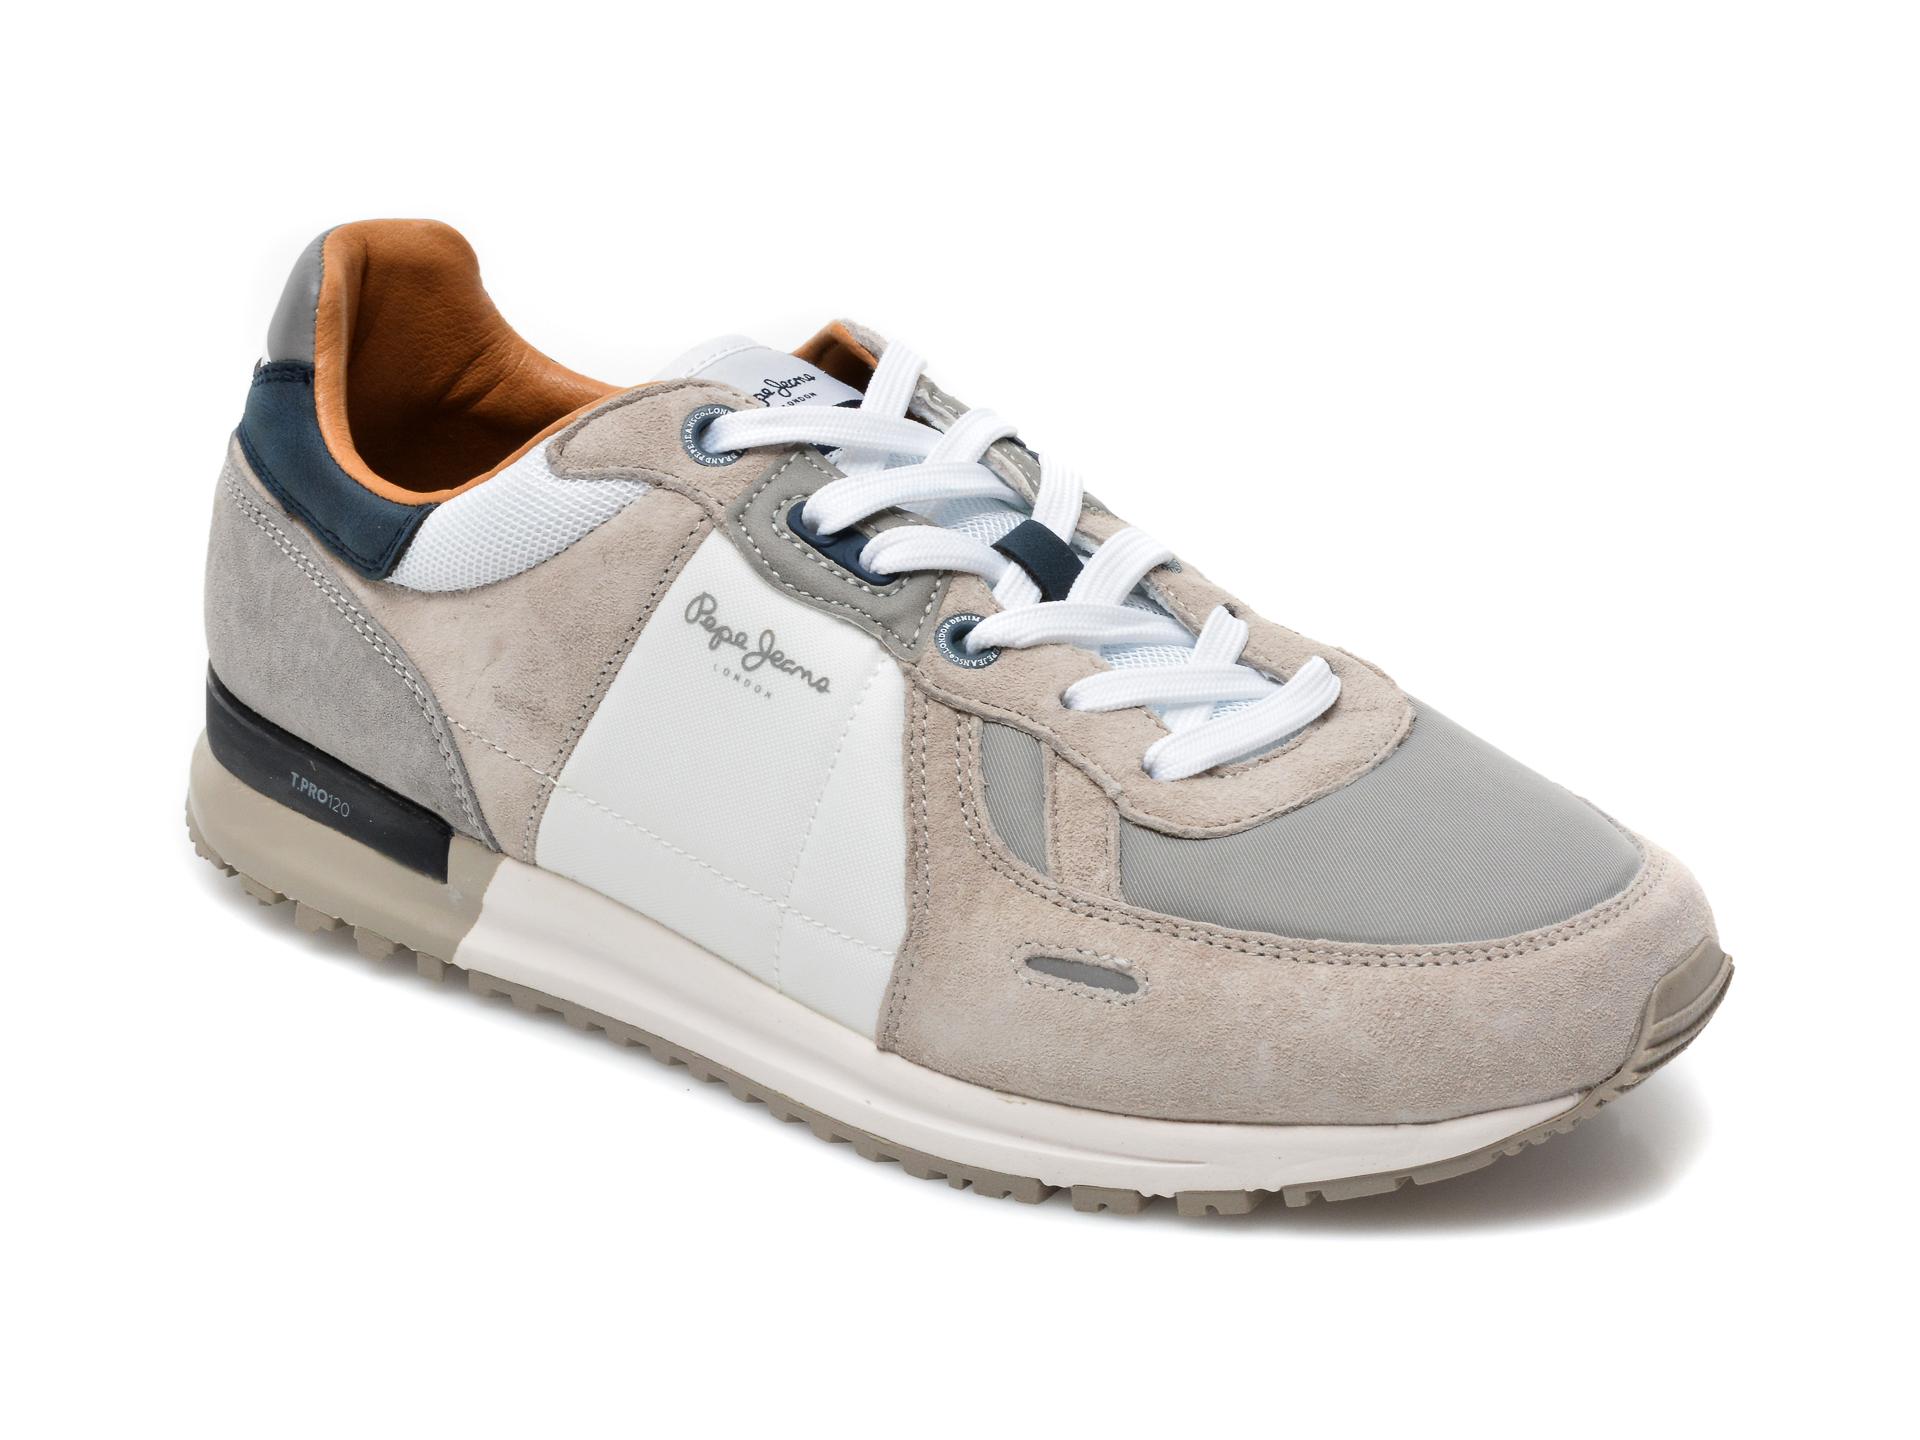 Pantofi sport PEPE JEANS gri, 3073199, din material textil si piele intoarsa imagine otter.ro 2021